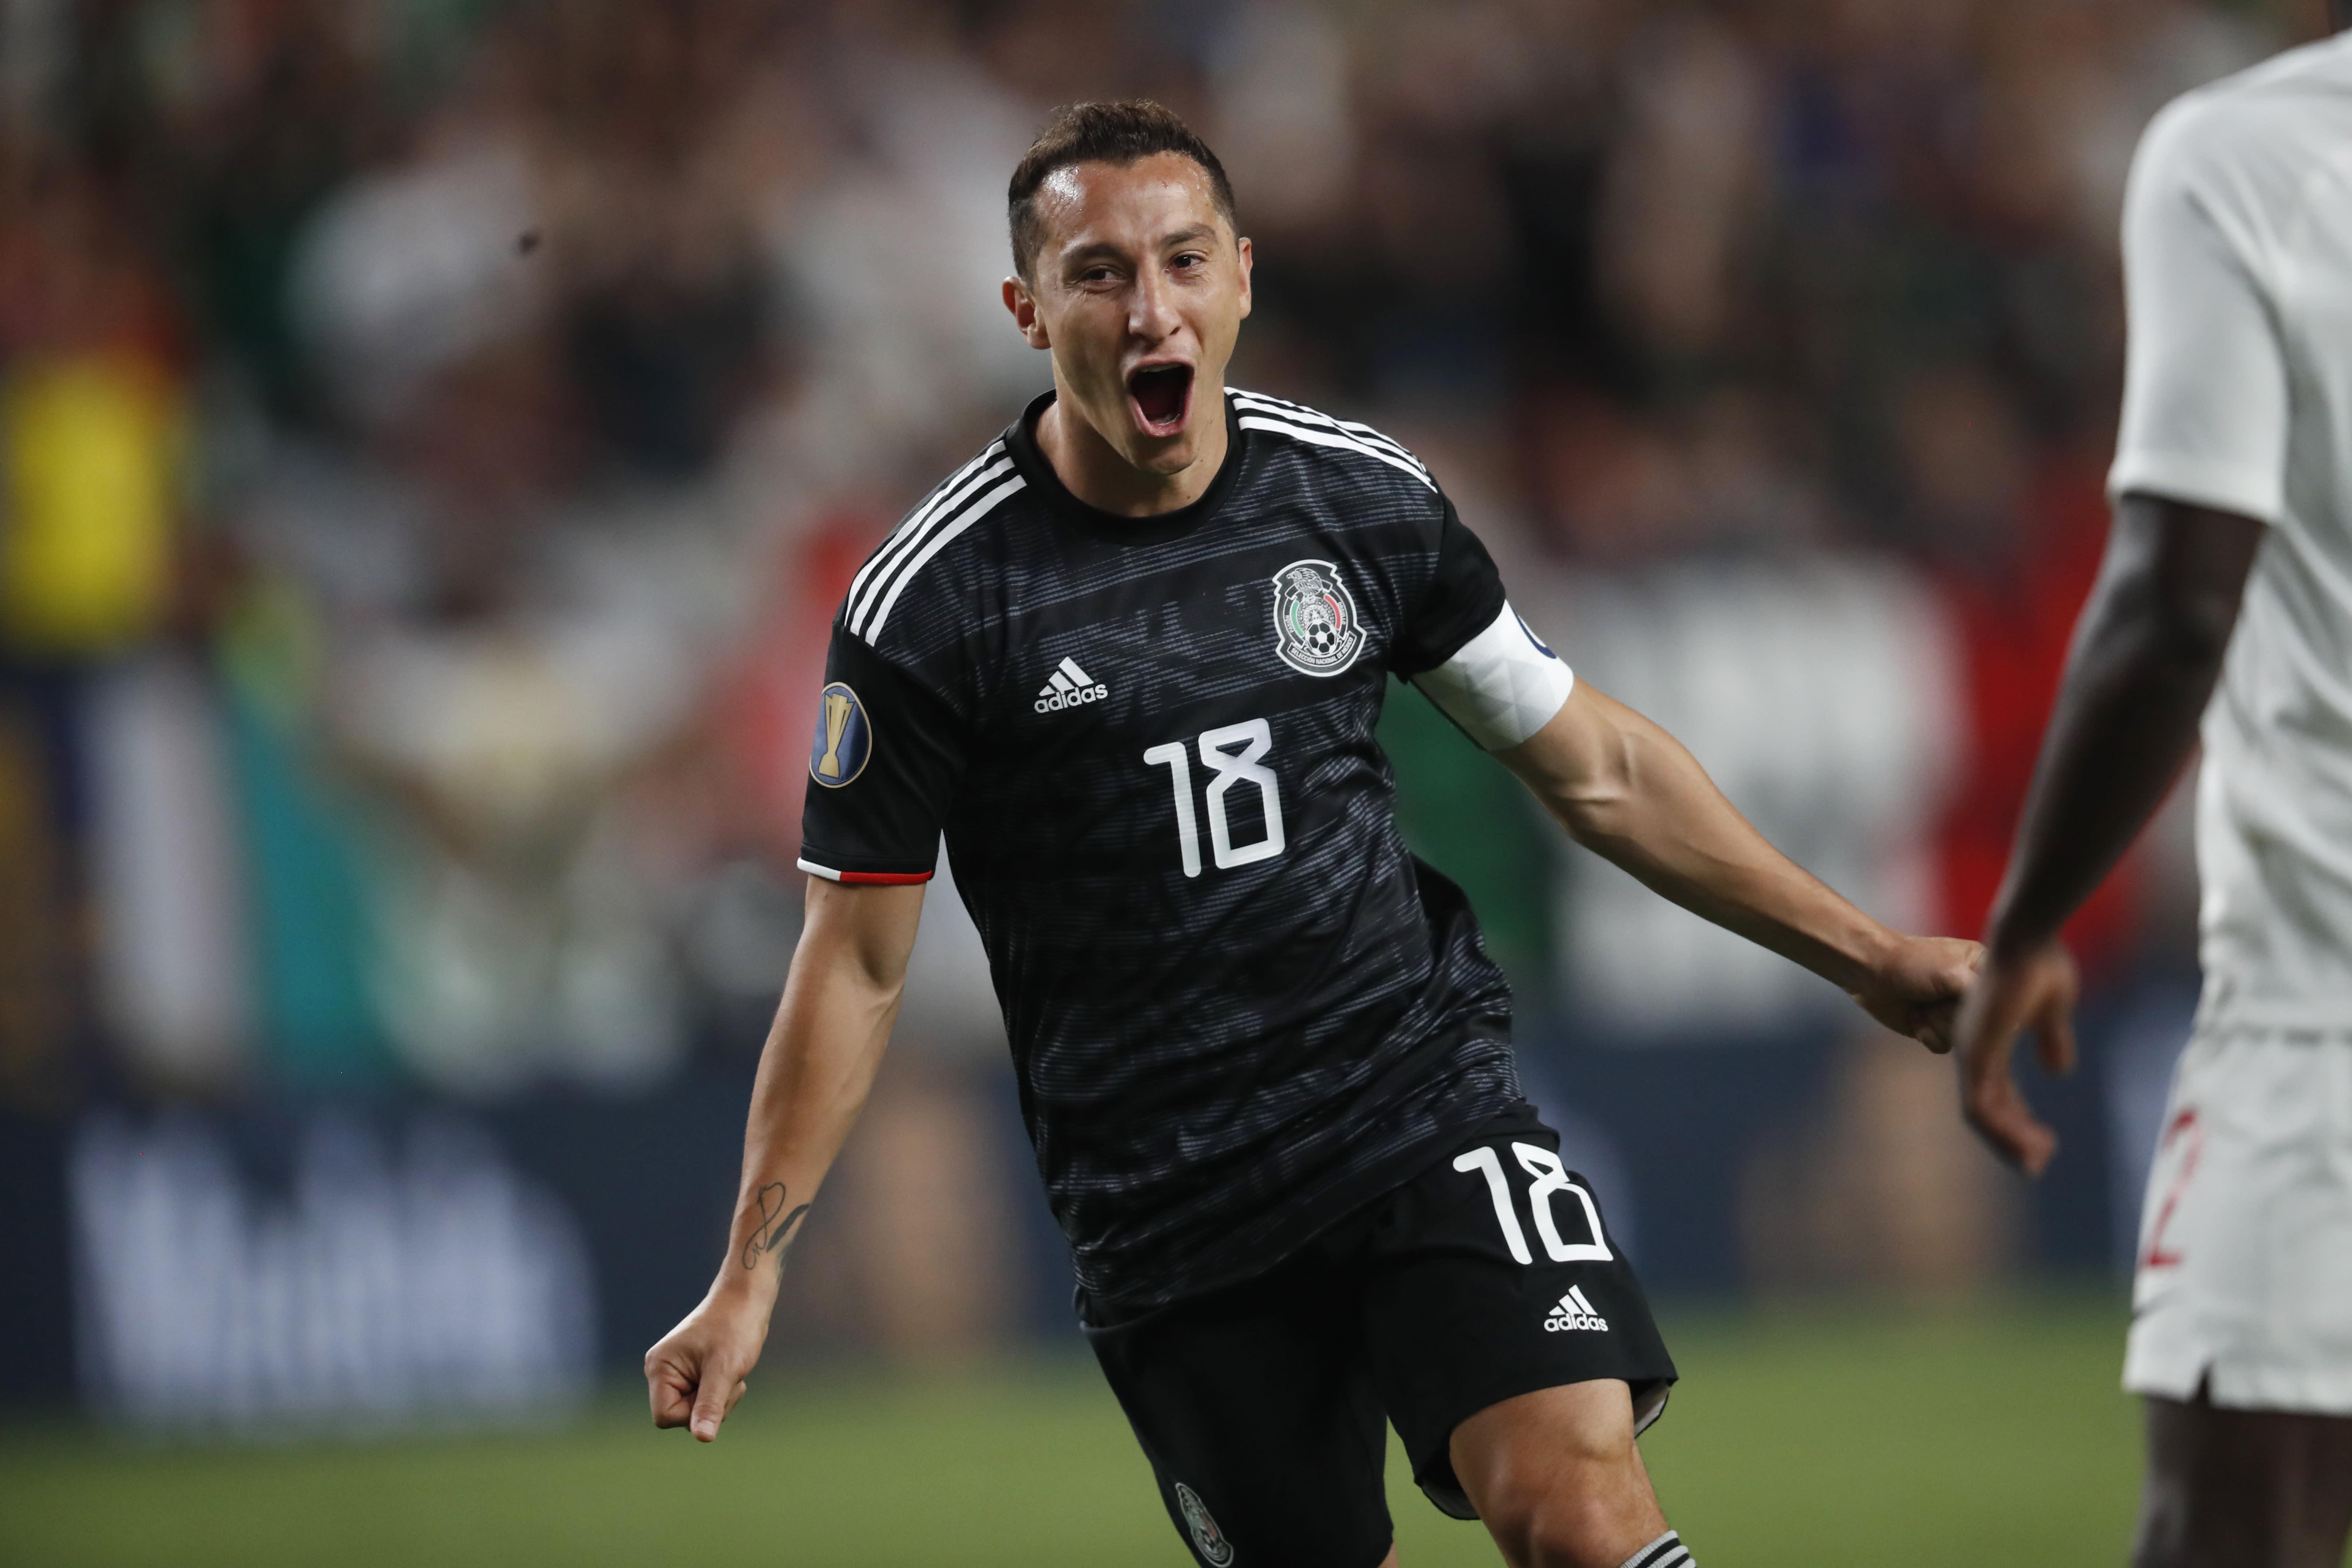 af46207acde15 Guardado scores 2 as Mexico beats Canada 3-1